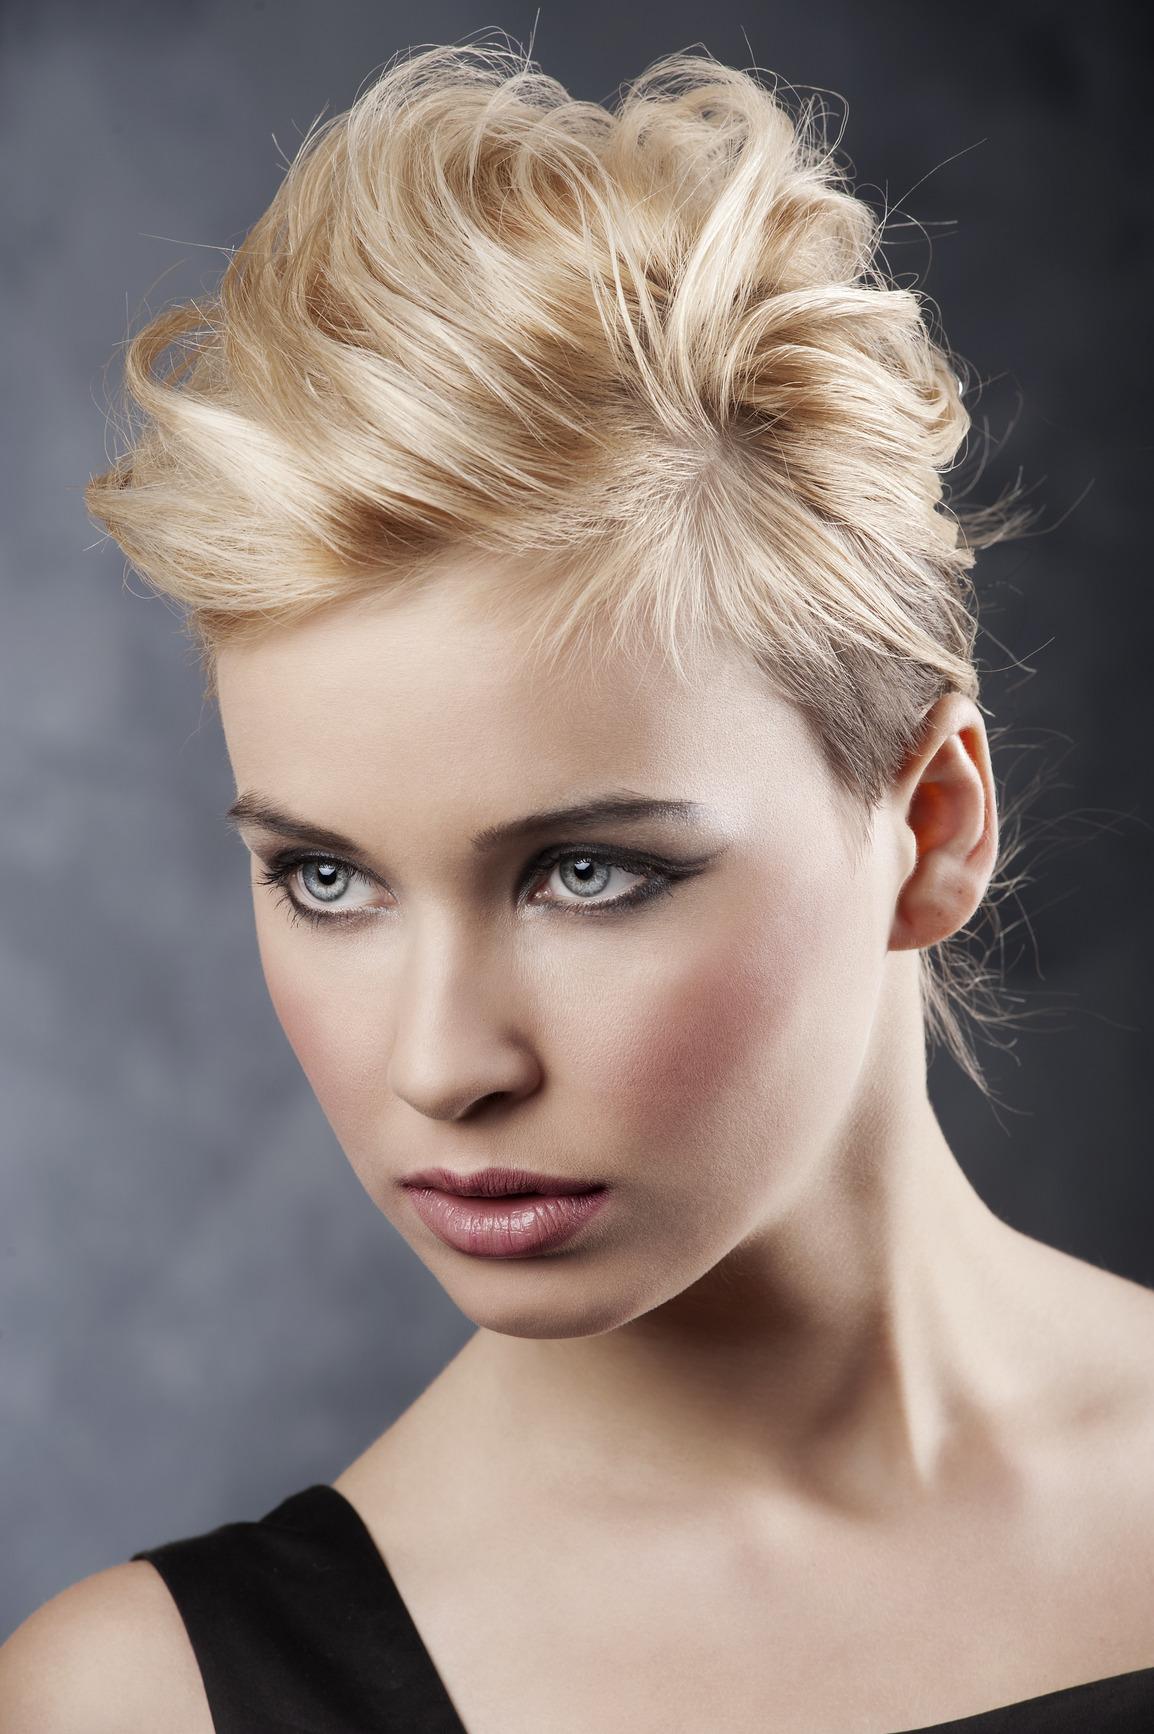 photodune-3478049-hair-style-portrait-m.jpg